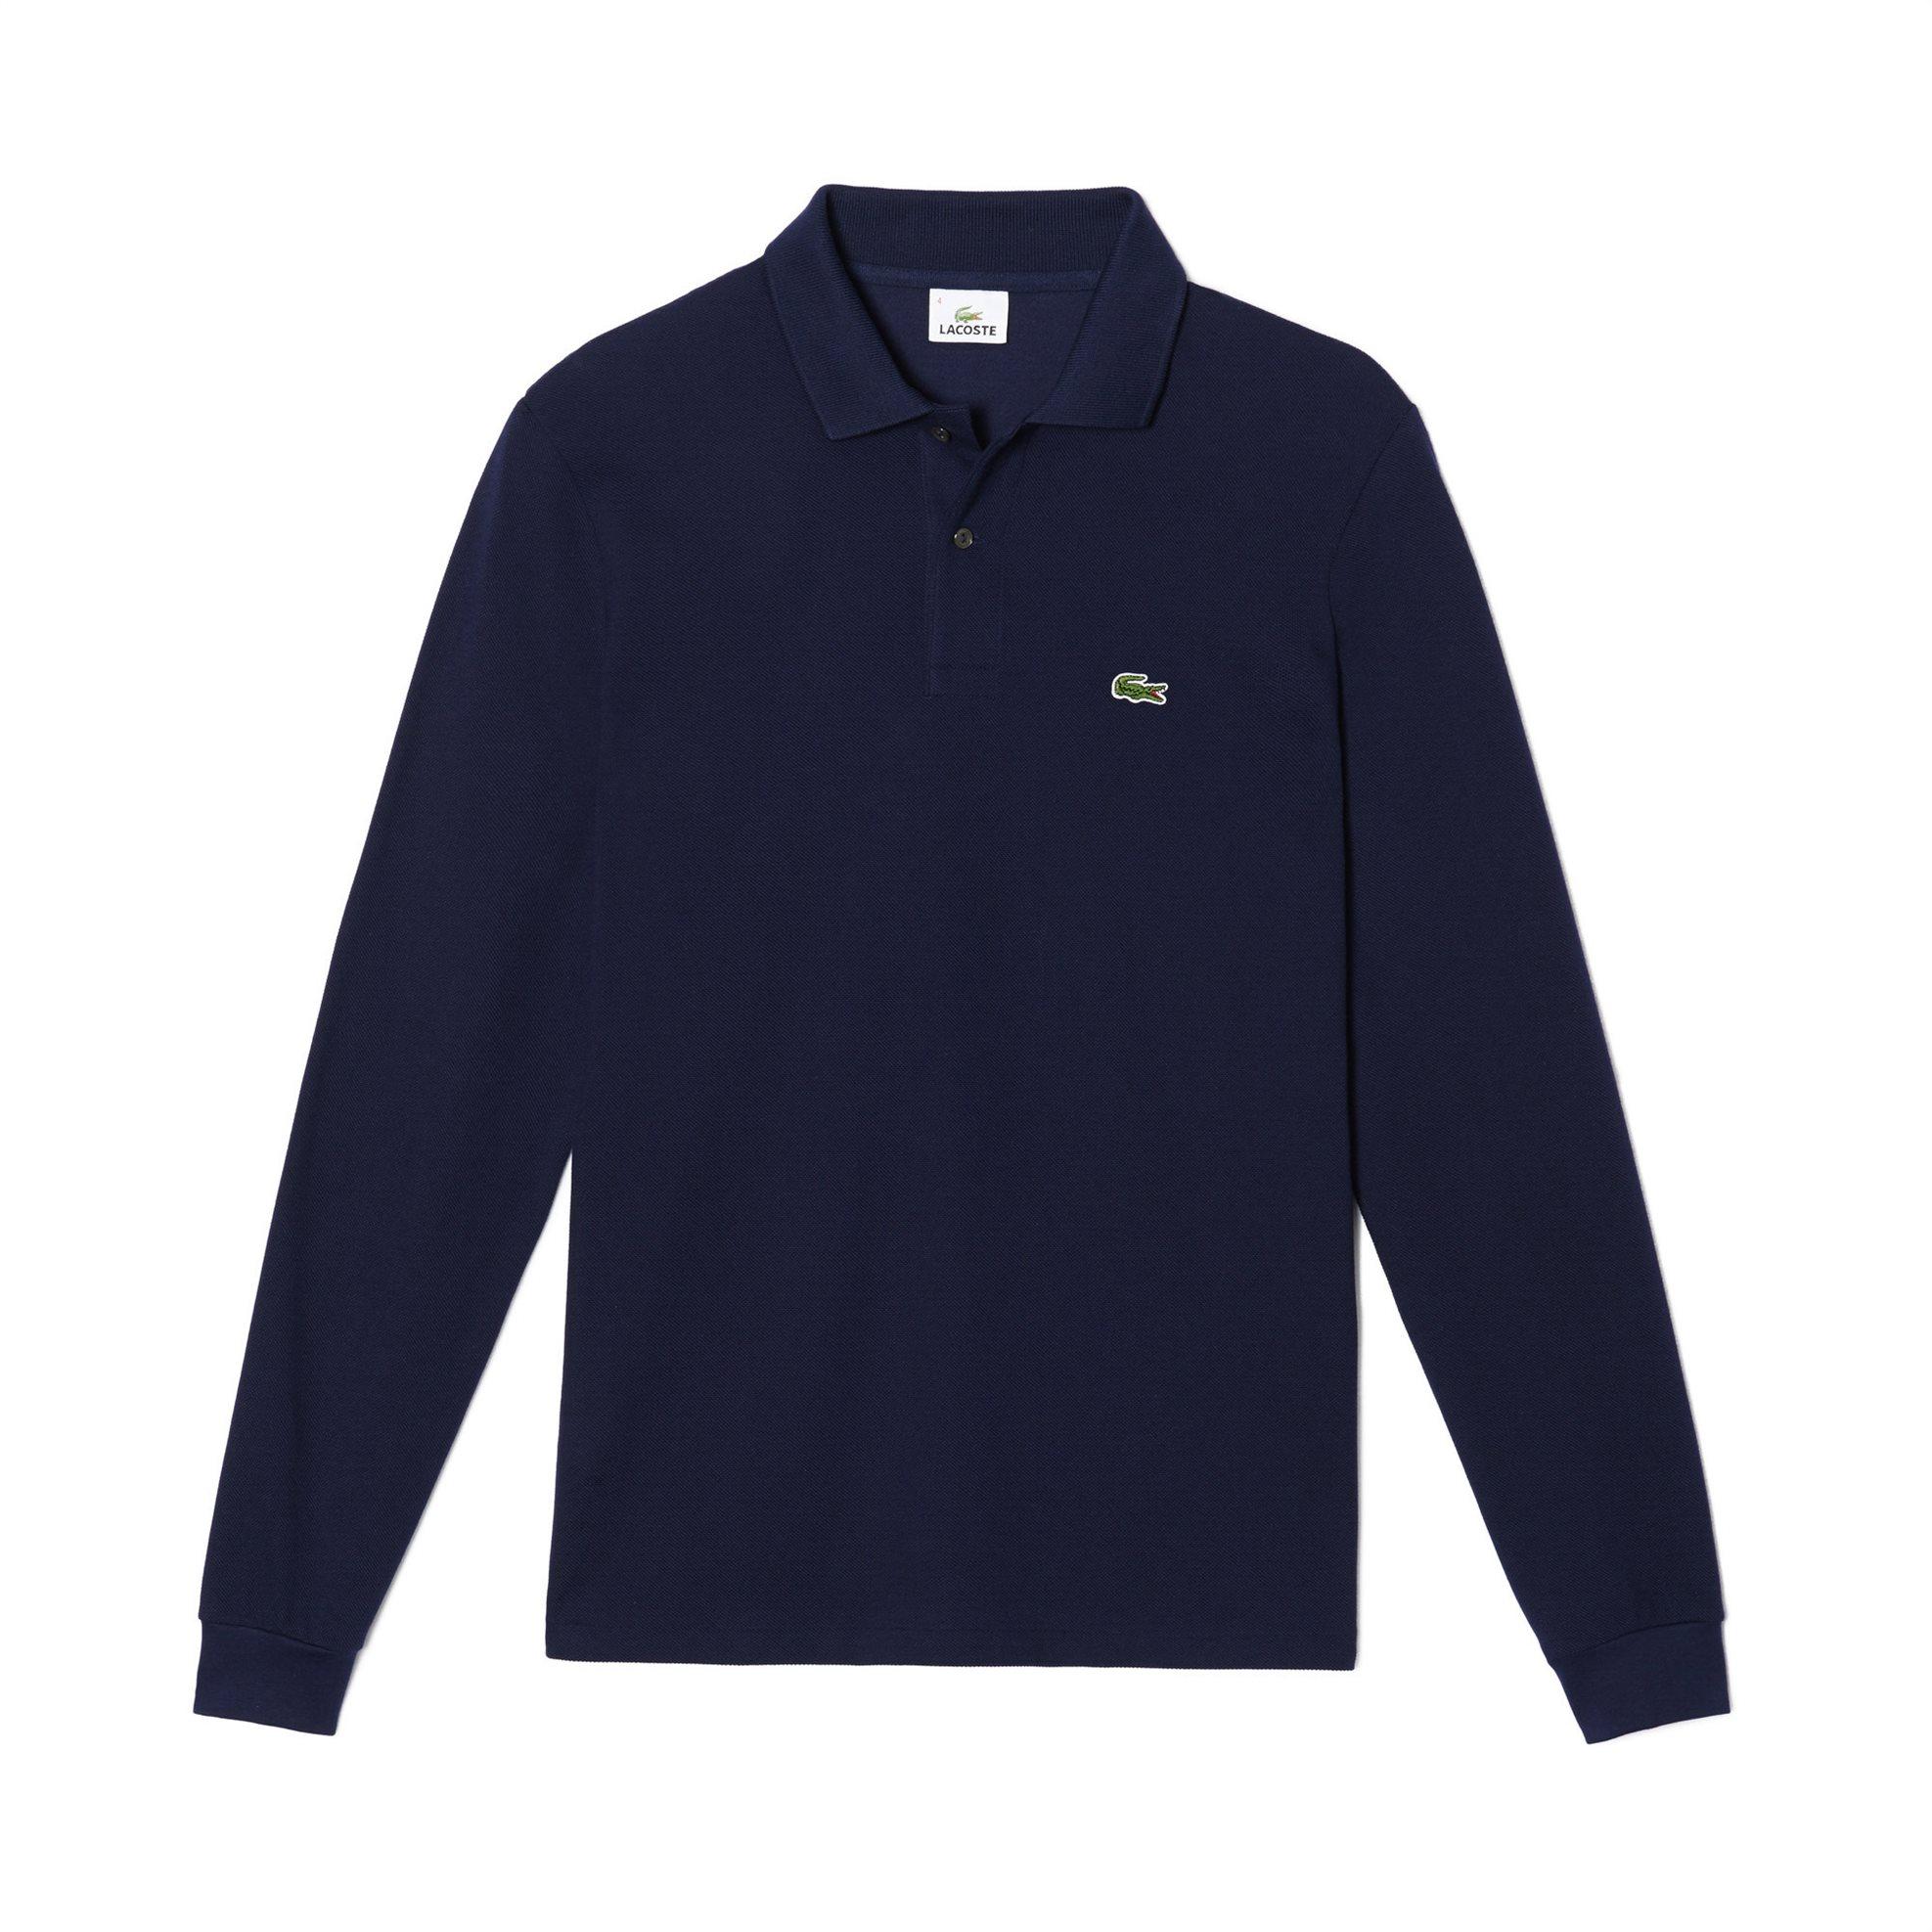 Lacoste ανδρική μπλούζα Polo L.12.12 με μακρύ μανίκι - L1312 - Μπλε Σκούρο ανδρασ   ρουχα    νεεσ αφιξεισ   μπλούζες   πόλο